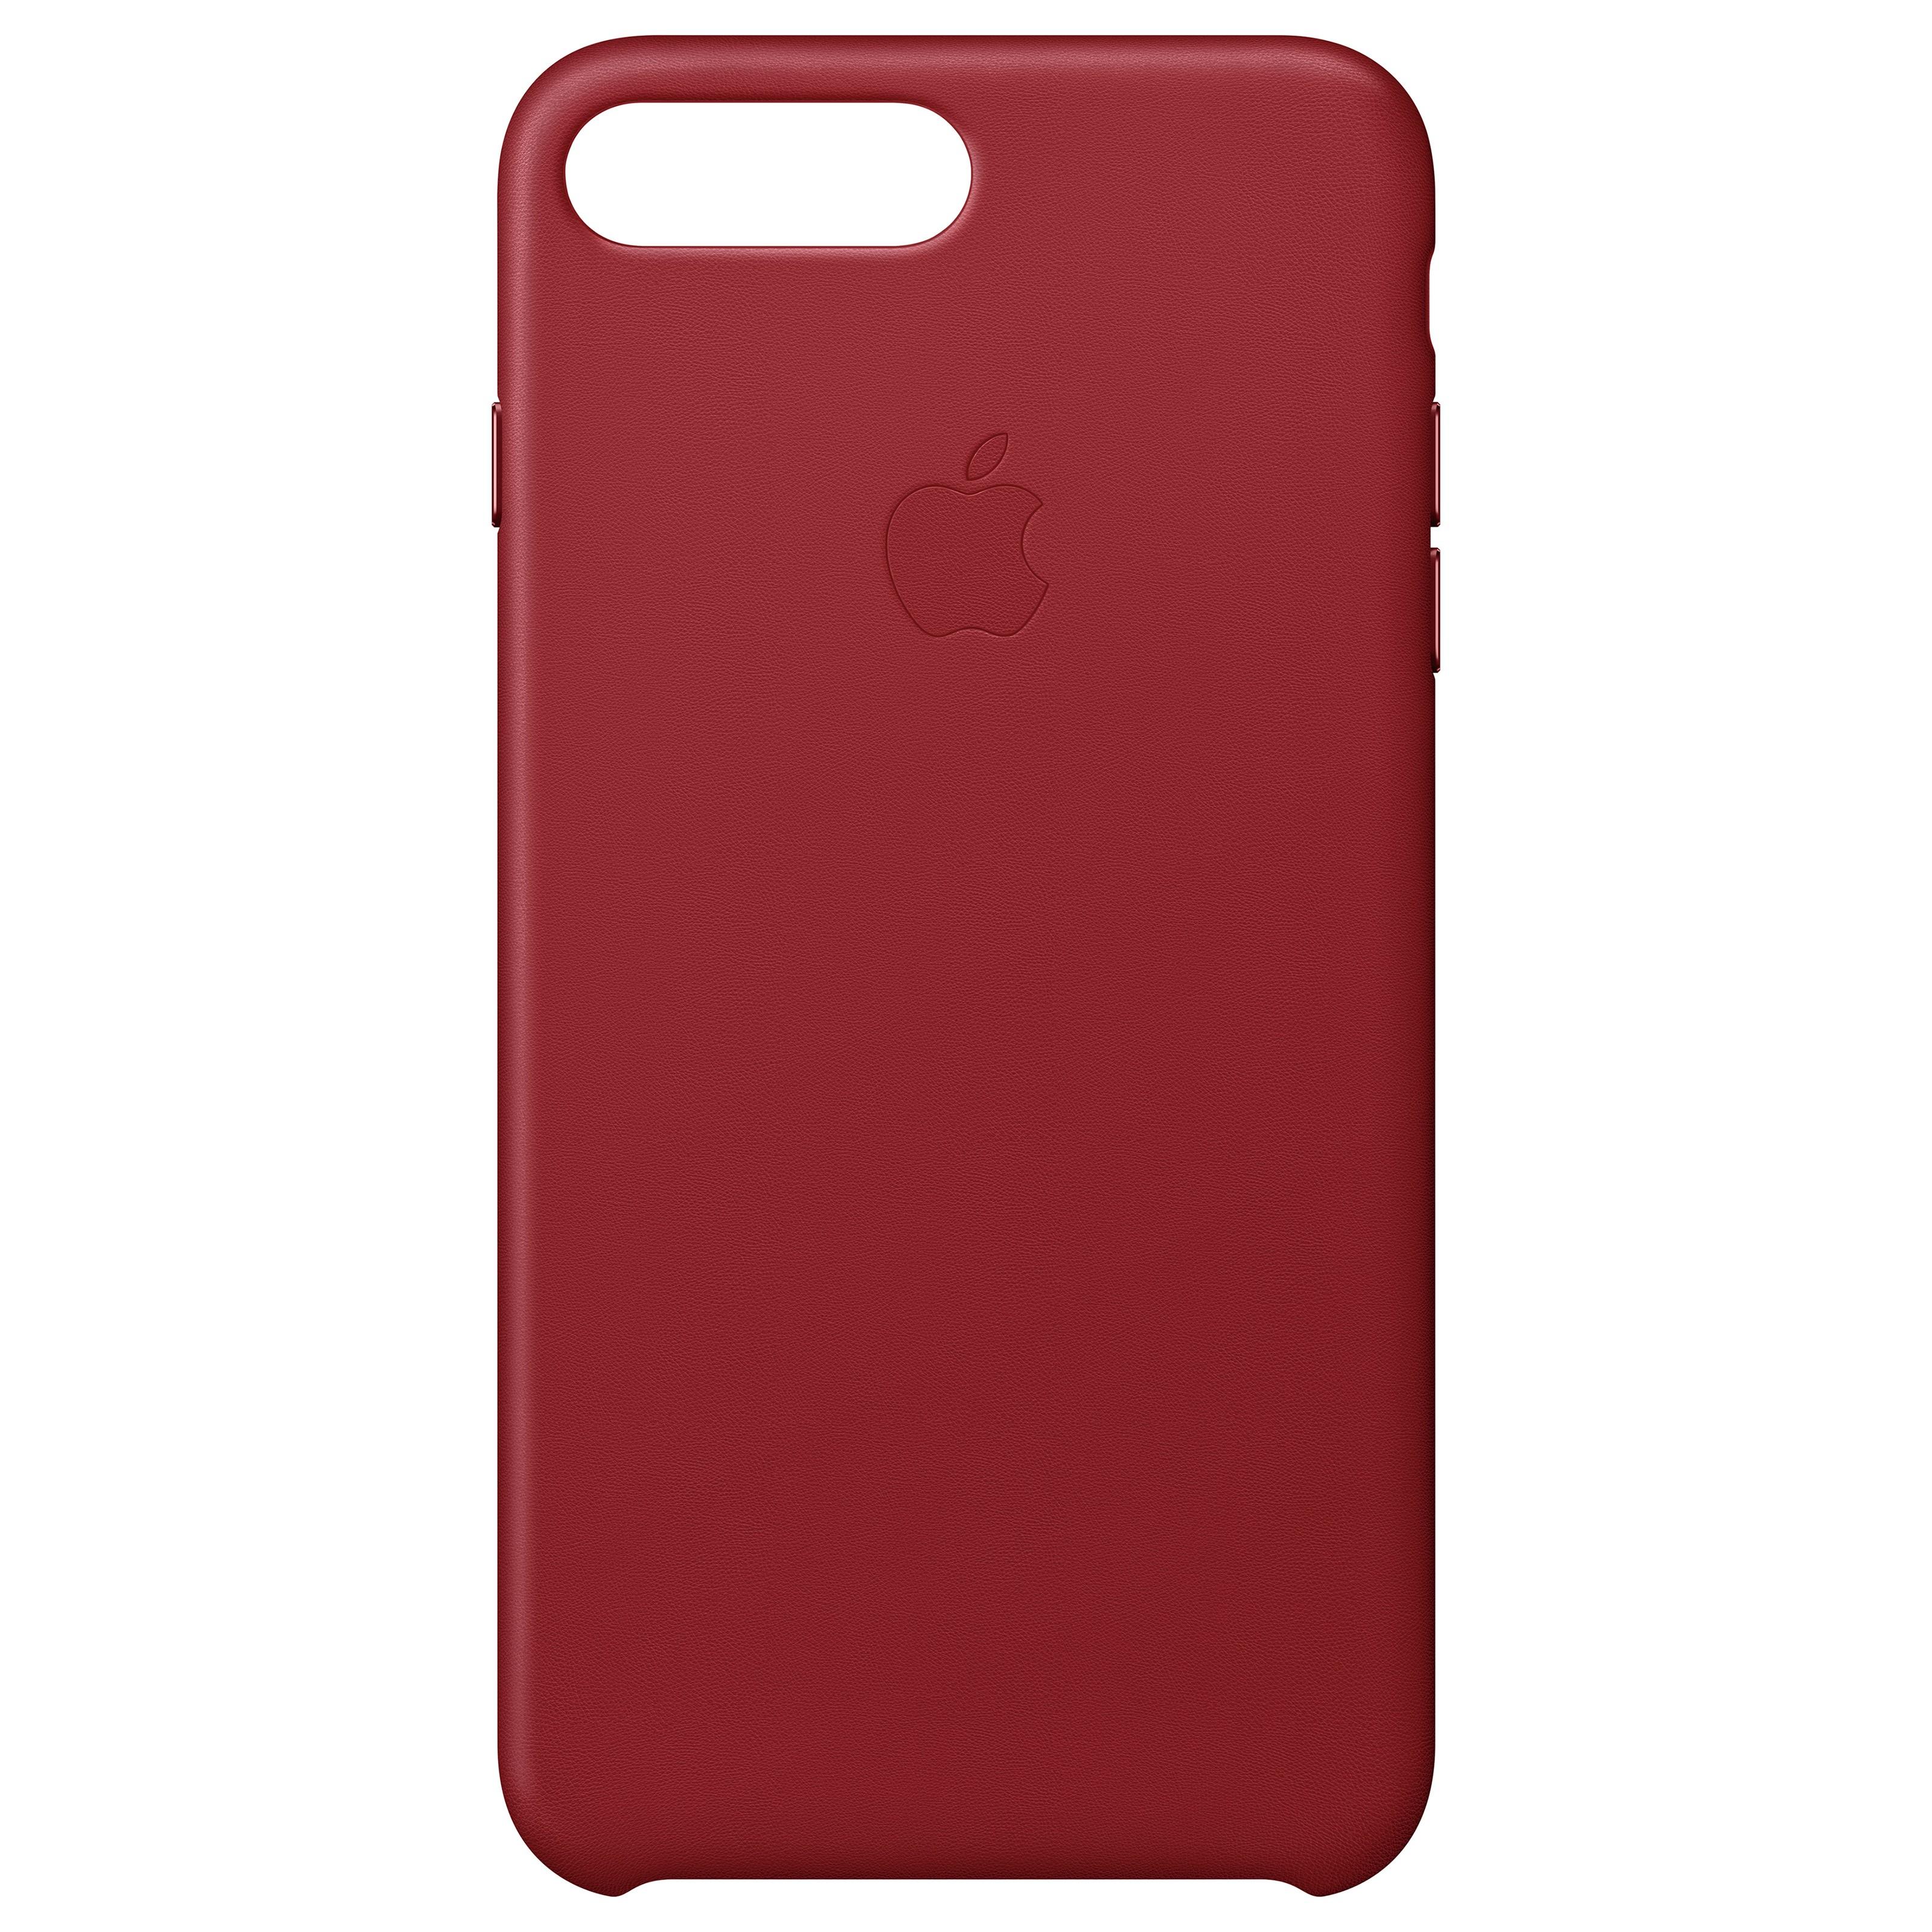 MQHN2ZM/A : iPhone 8 Plus skinndeksel (rød)